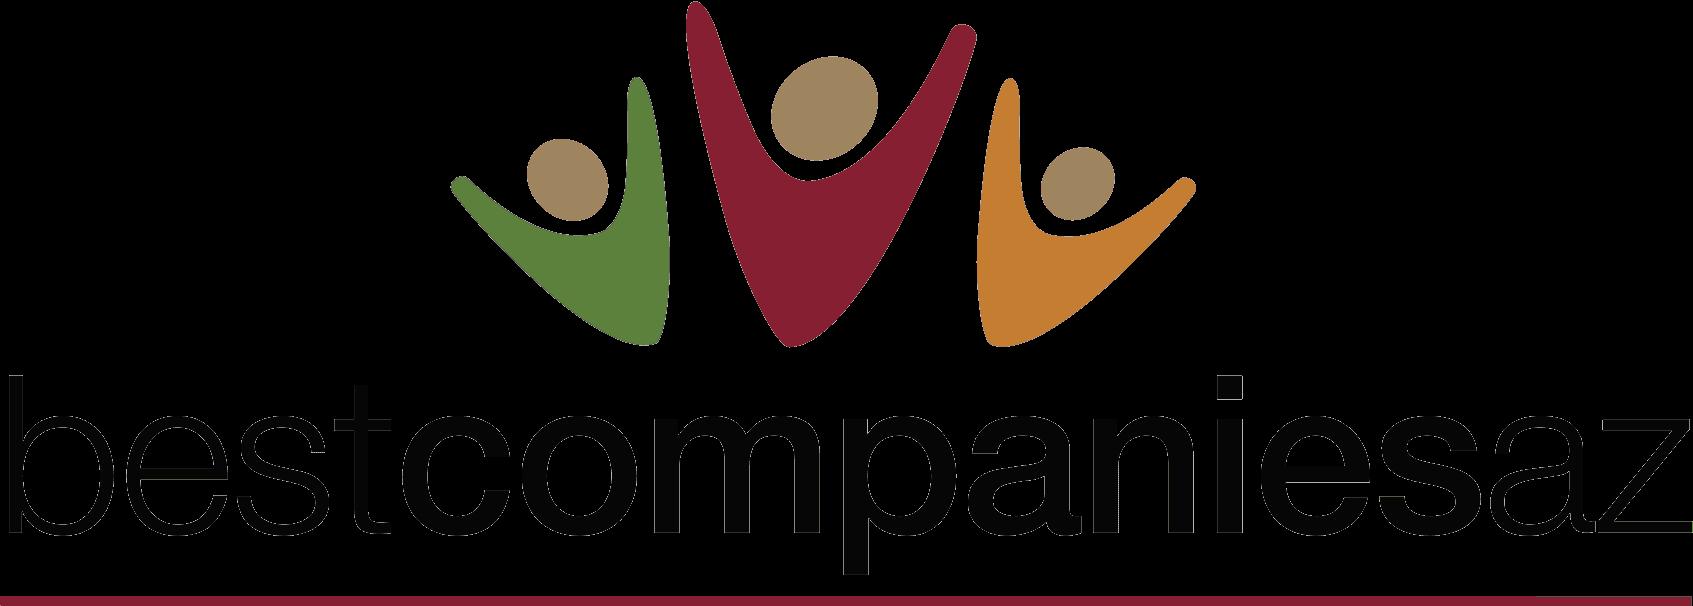 best company logo